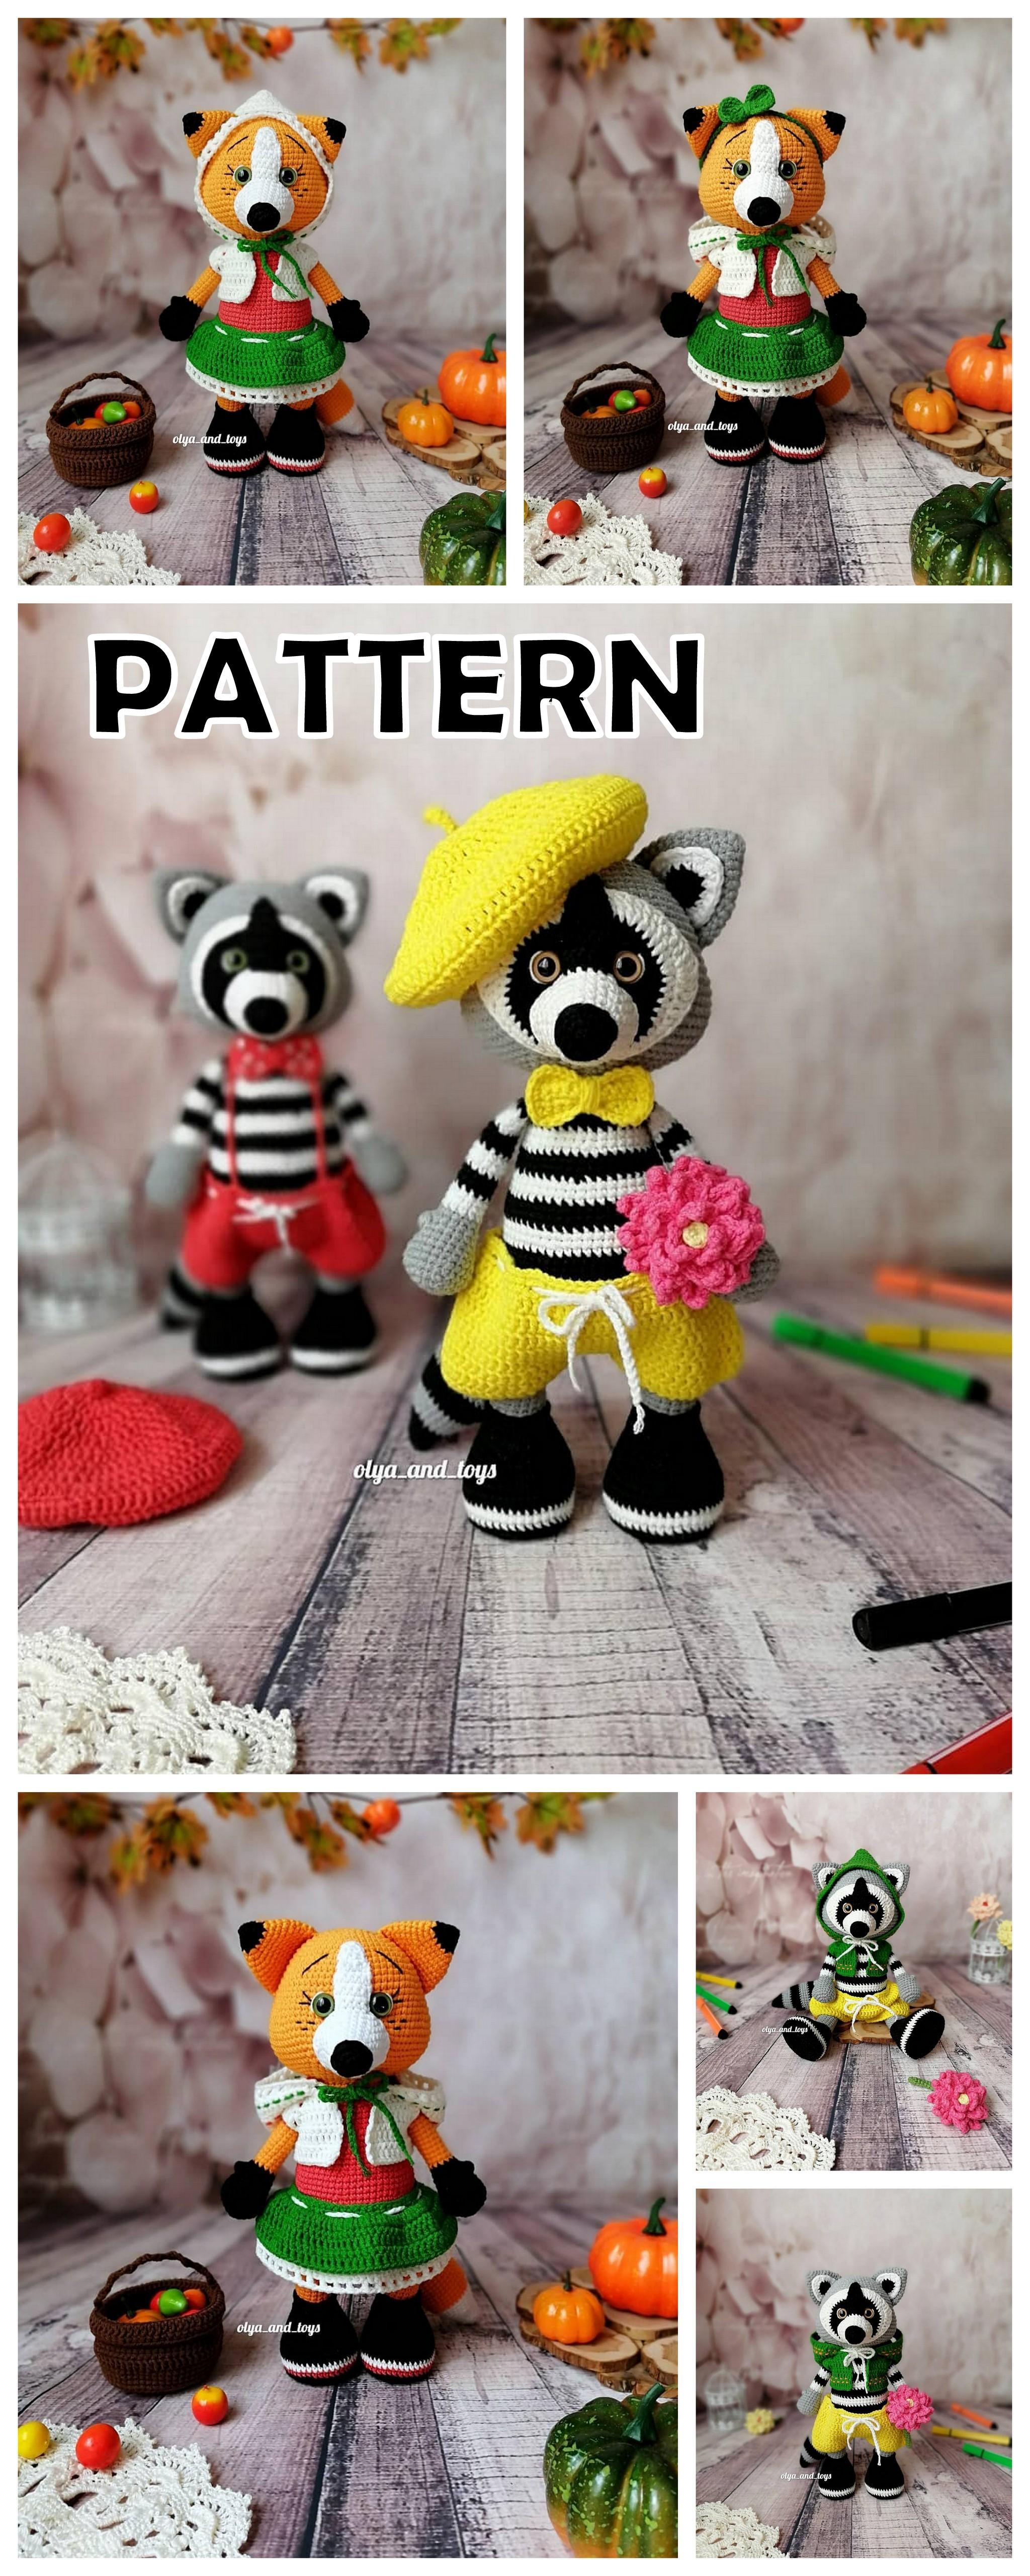 18 Best Amigurumi Crochet Doll And Animal Patterns